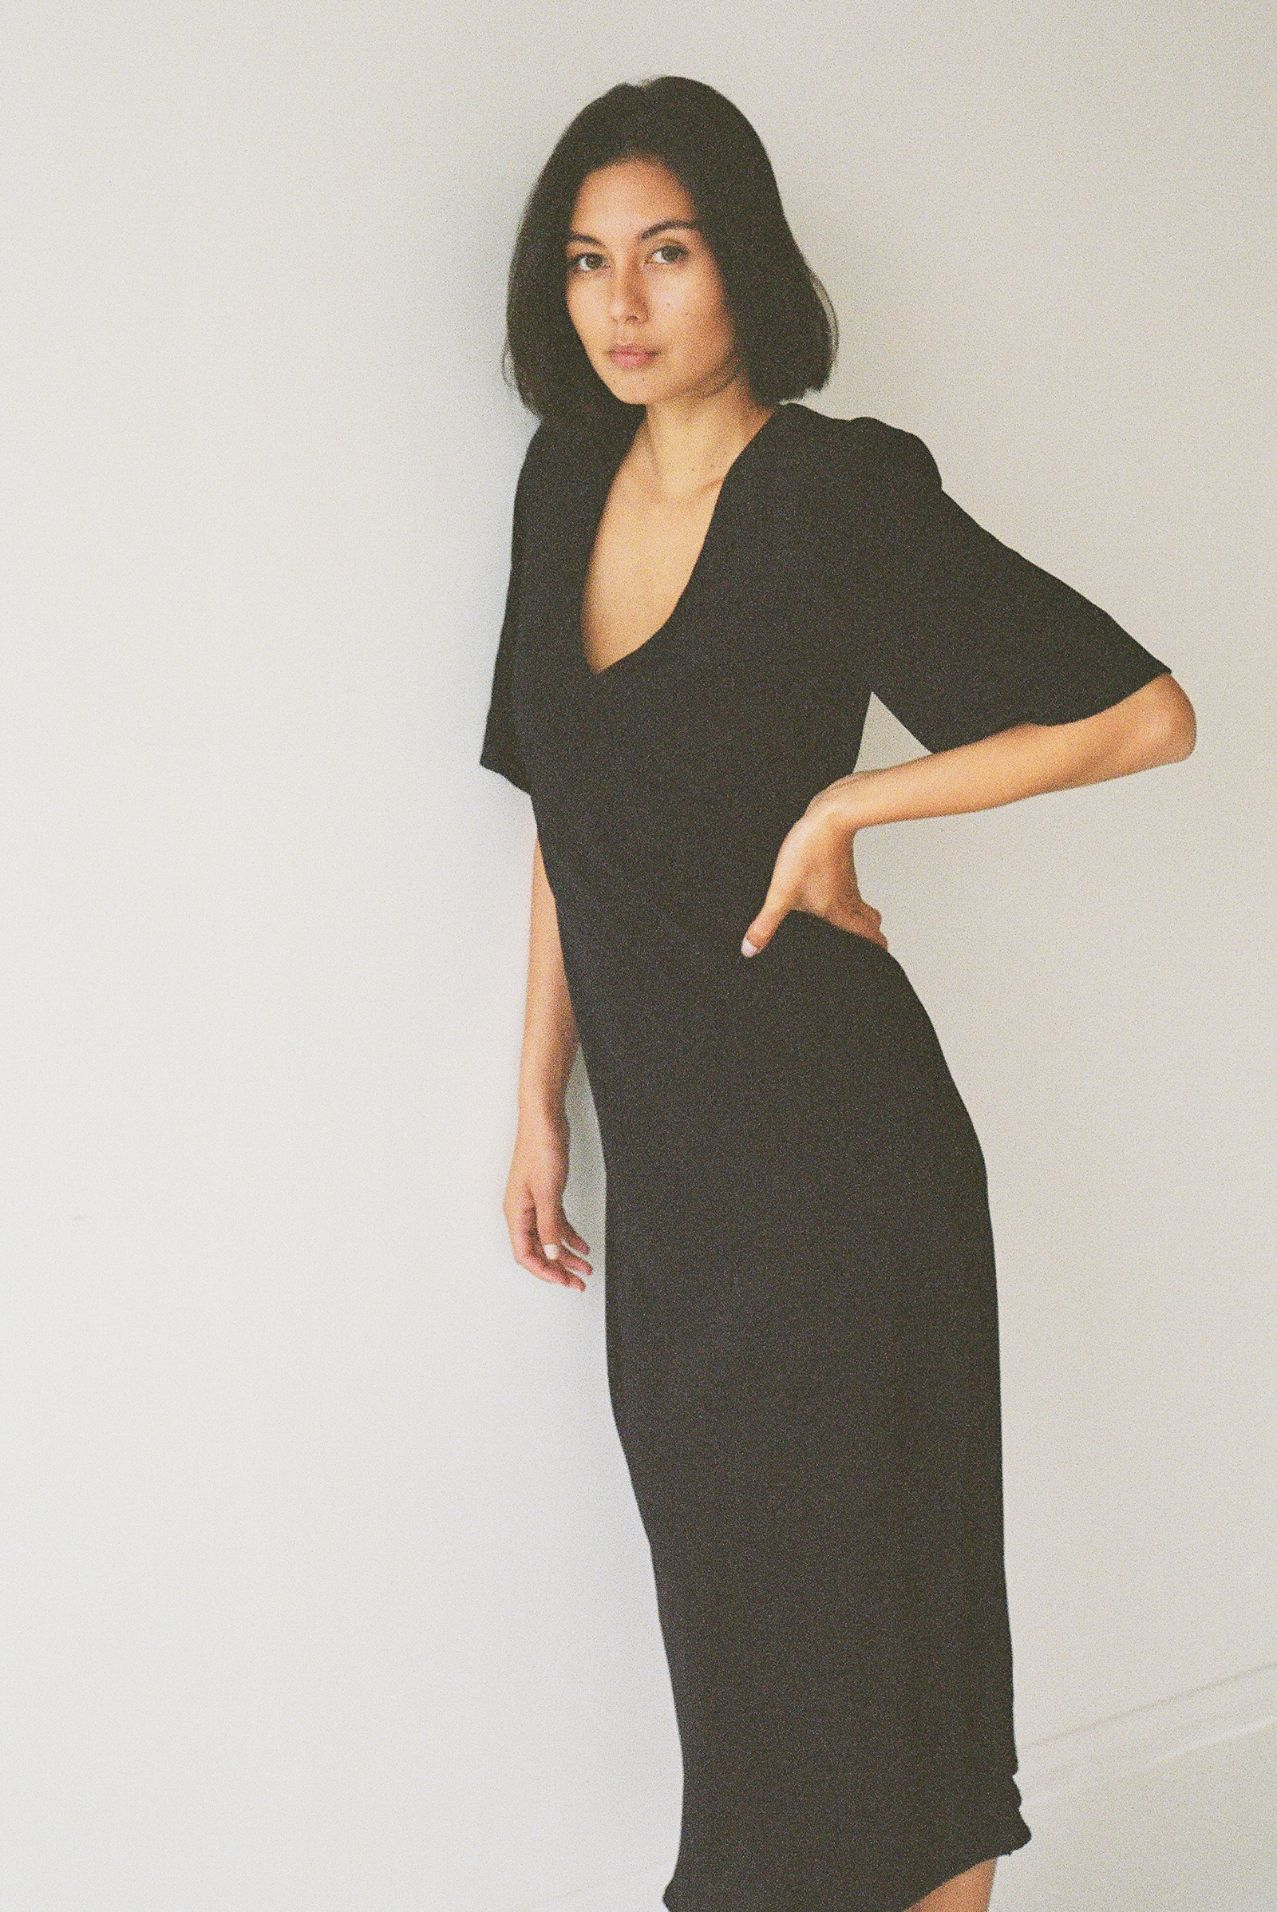 Paloma deux dress black silk - Ellis Label - Made to order womenswear - New Zealand_0059_82980028